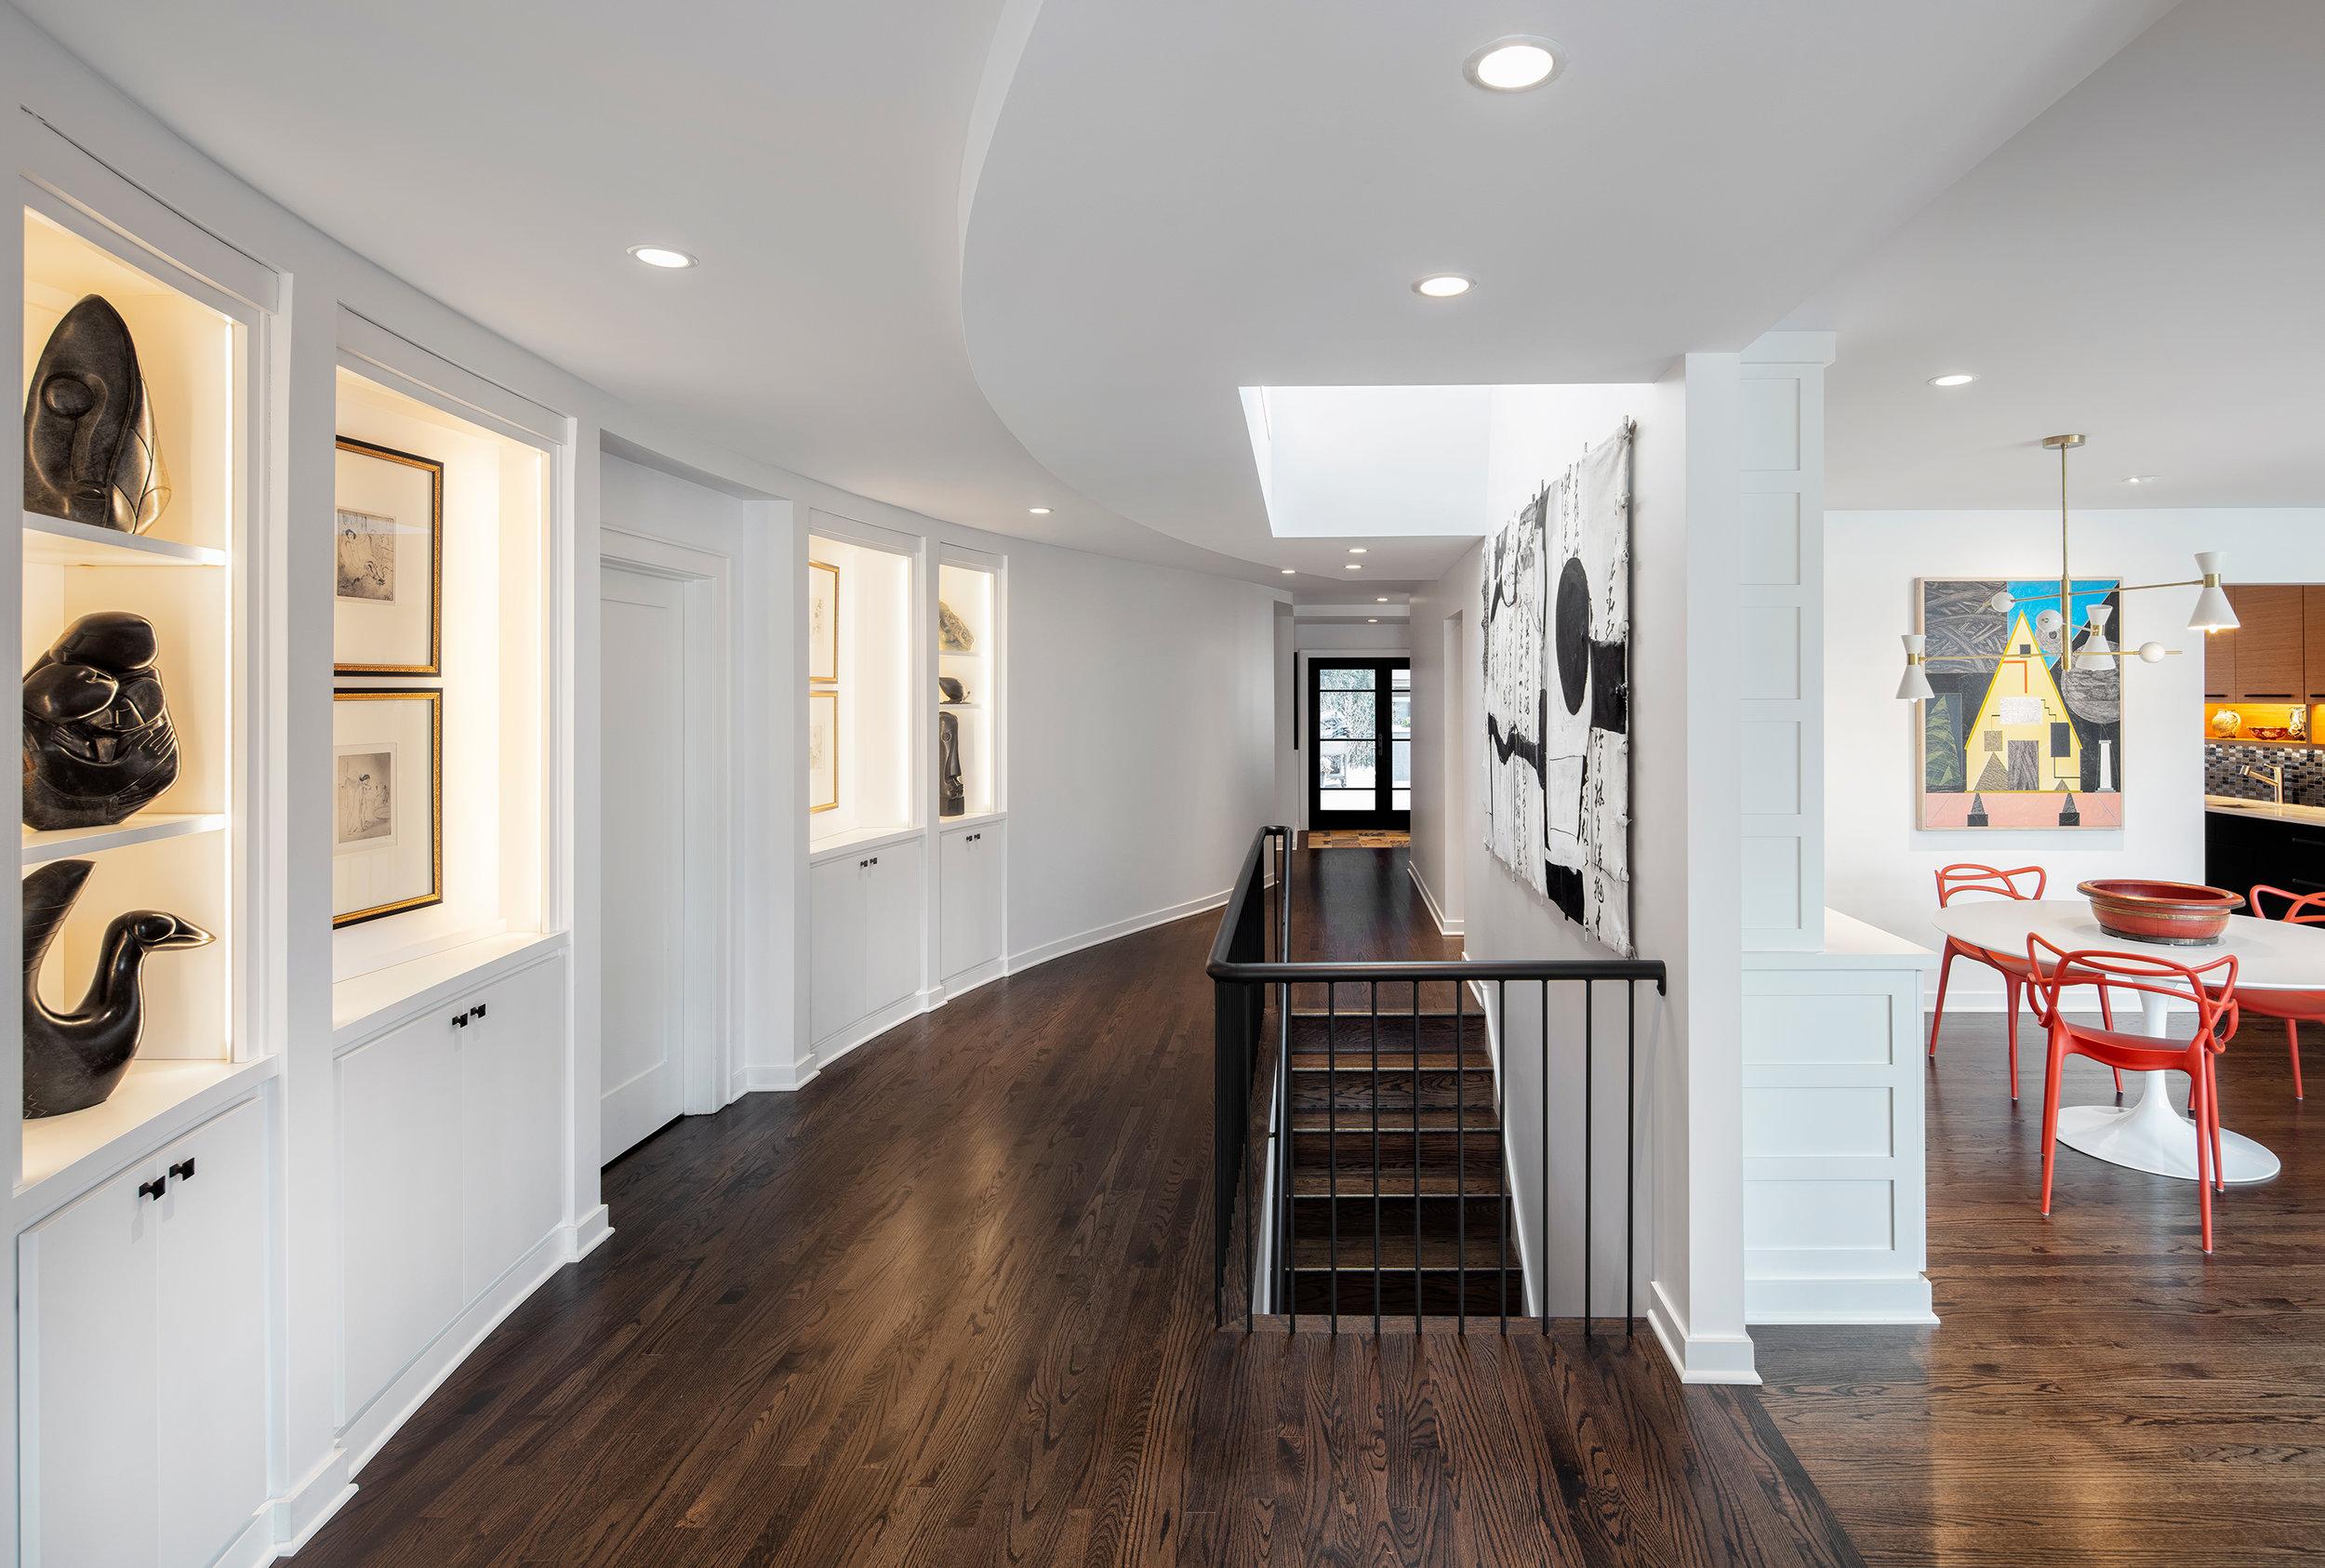 Curved Hallway with Skylight